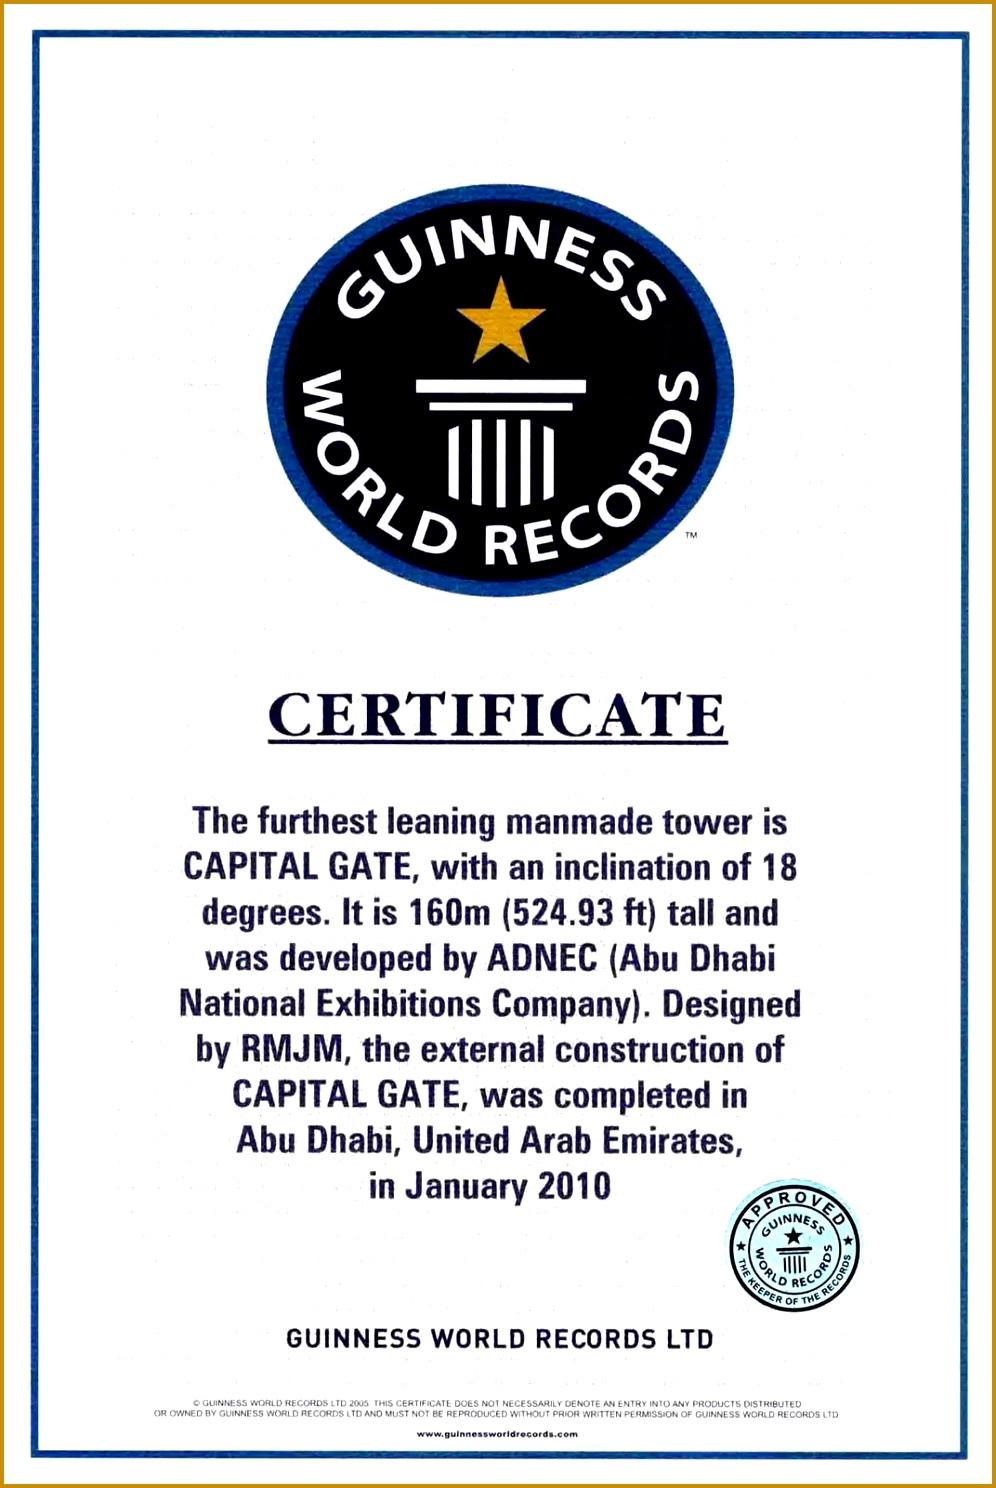 Guinness World Record Certificate Template 47533 Dubai Constructions